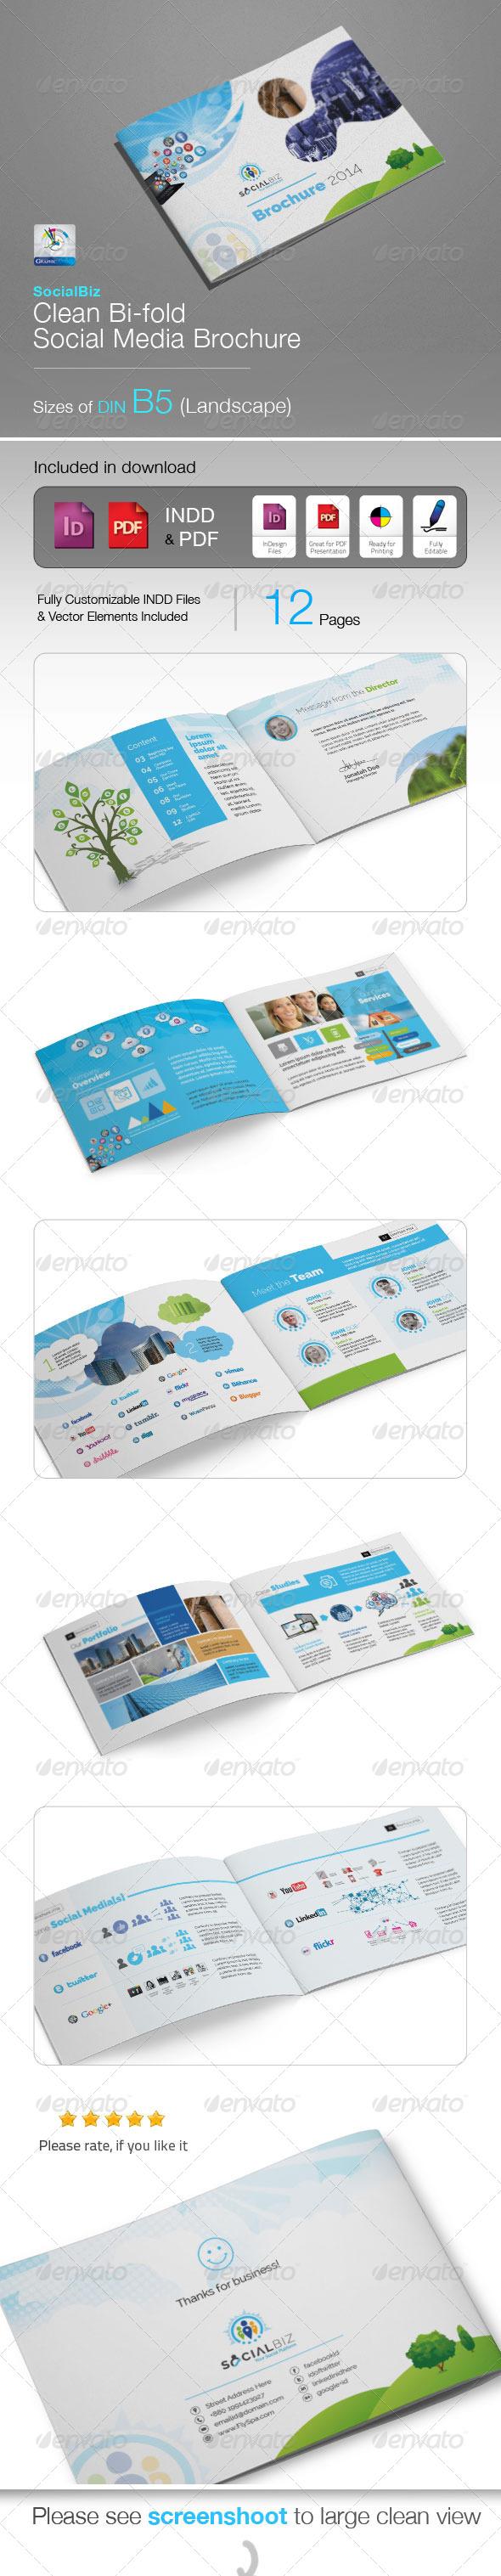 GraphicRiver SocialBiz B5 Social Media Brochure 5756448